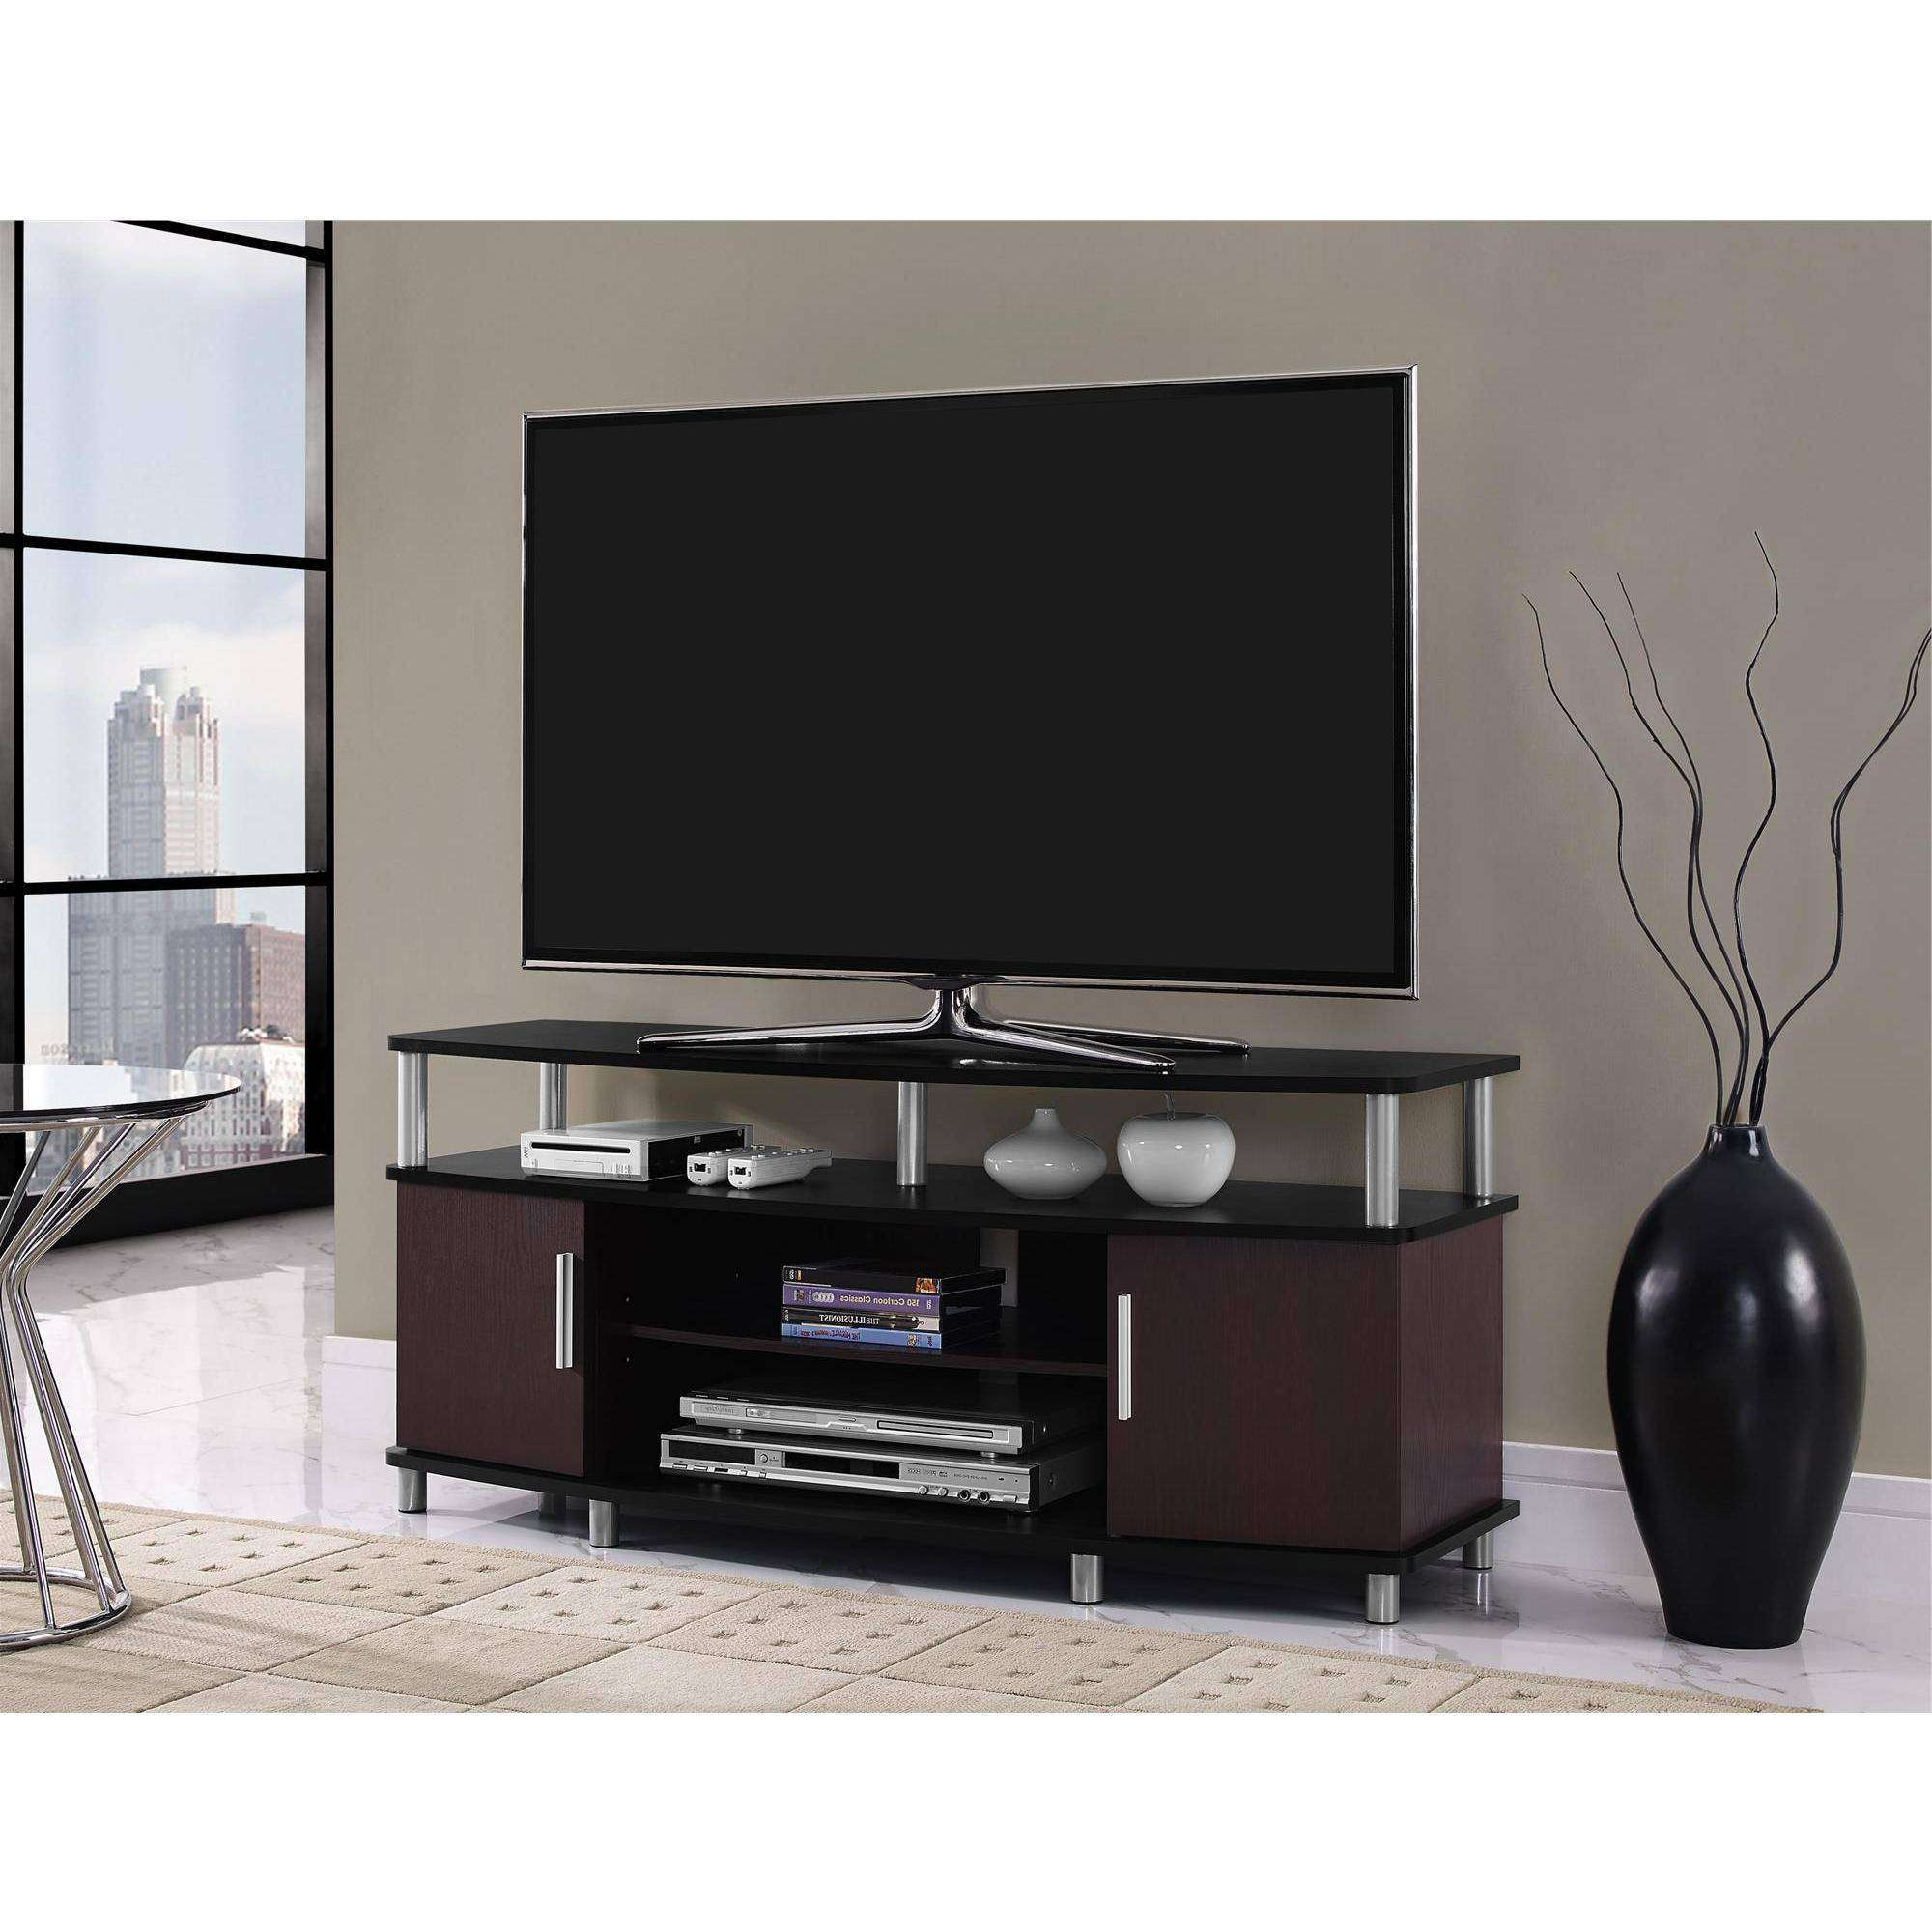 Tv Stands & Entertainment Centers – Walmart Pertaining To Entertainment Center Tv Stands (View 11 of 15)